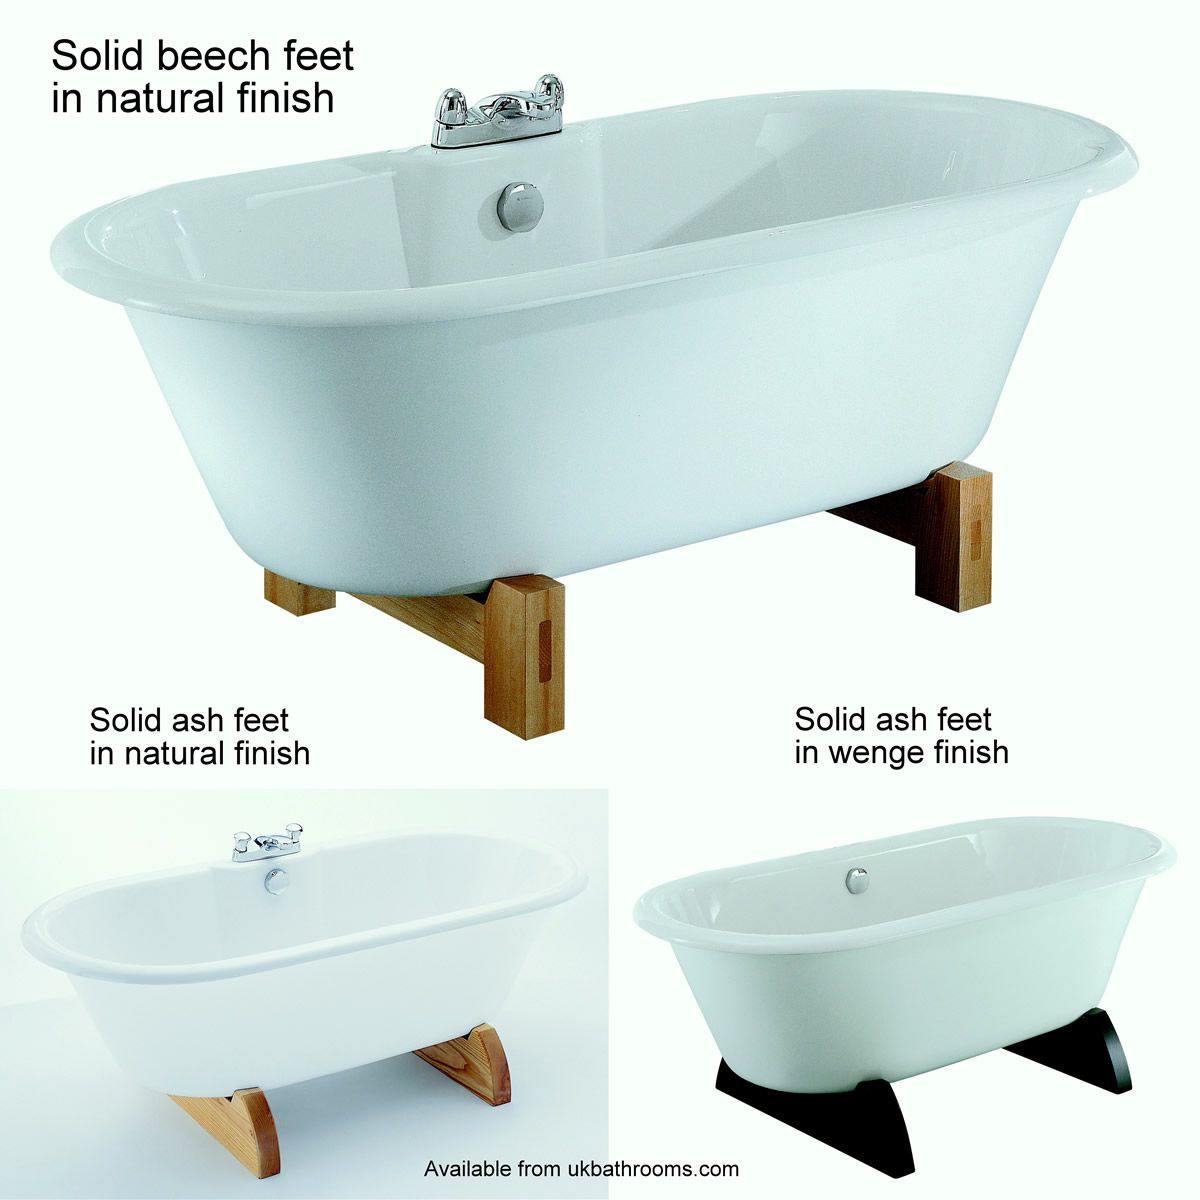 Adamsez Portobello fs Freestanding Roll Top Bath : UK Bathrooms